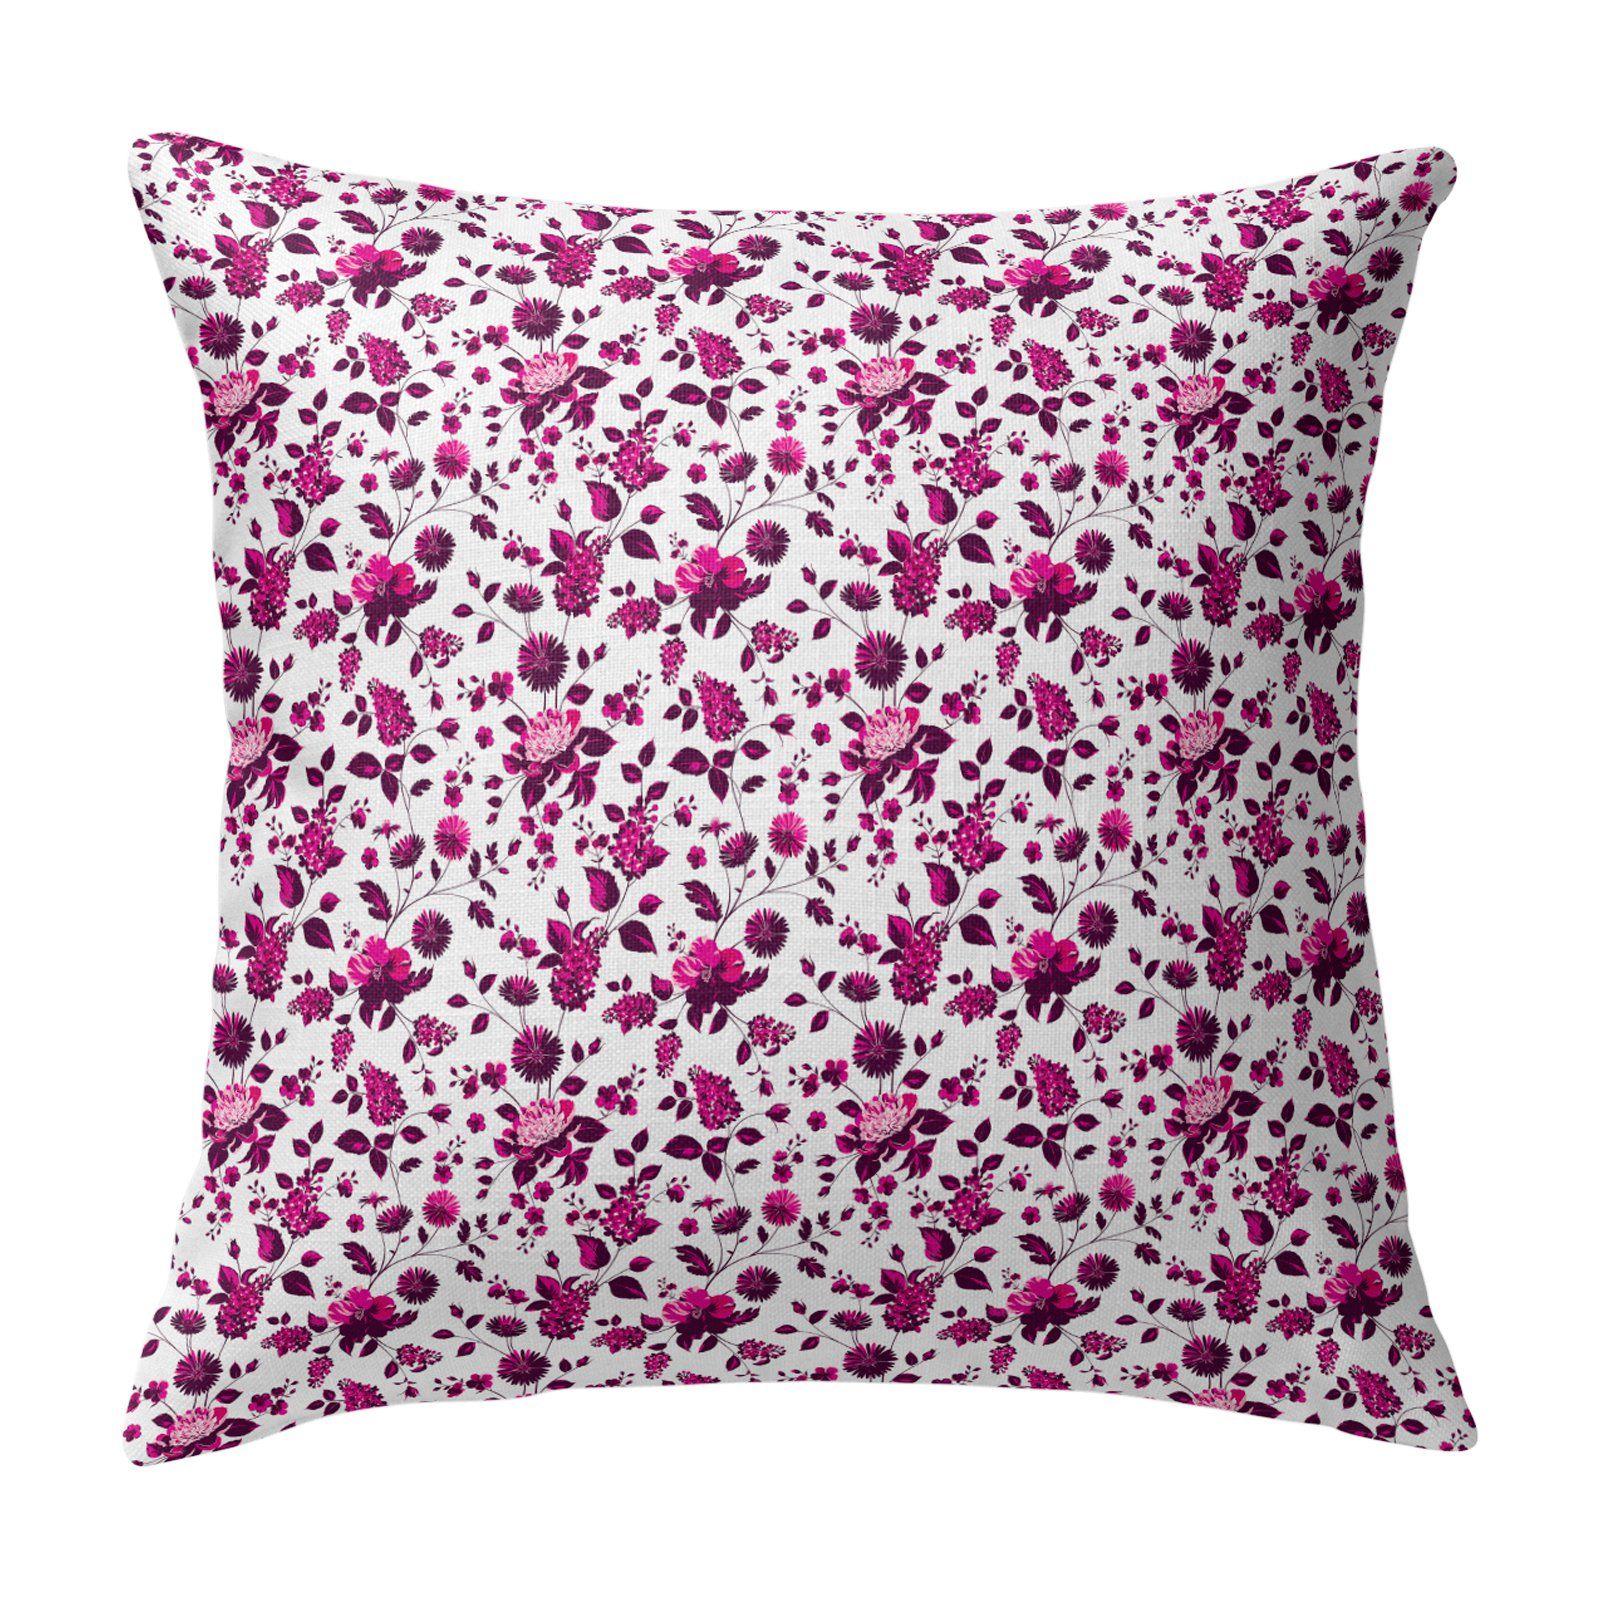 Kavka Designs Bouquet Bunch Accent Pillow By Terri Ellis